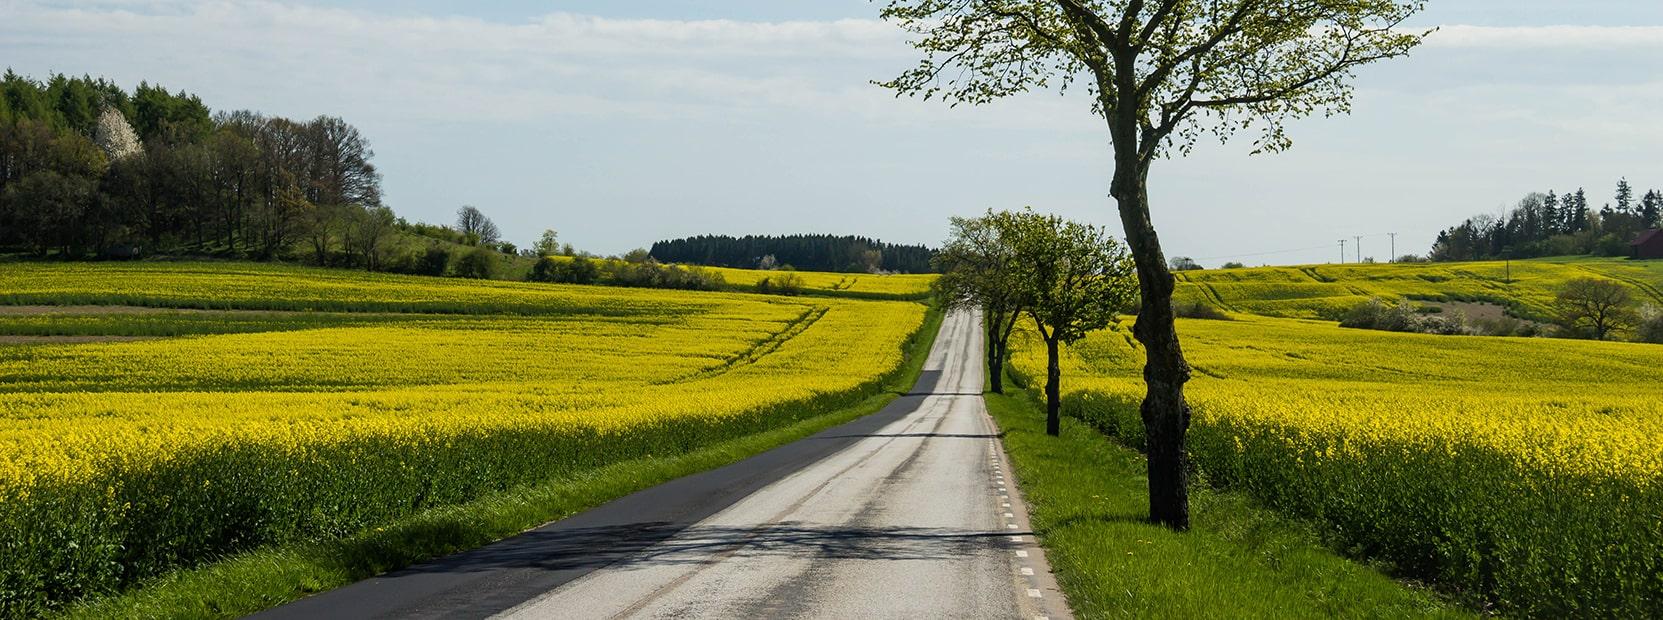 yellowfield-min